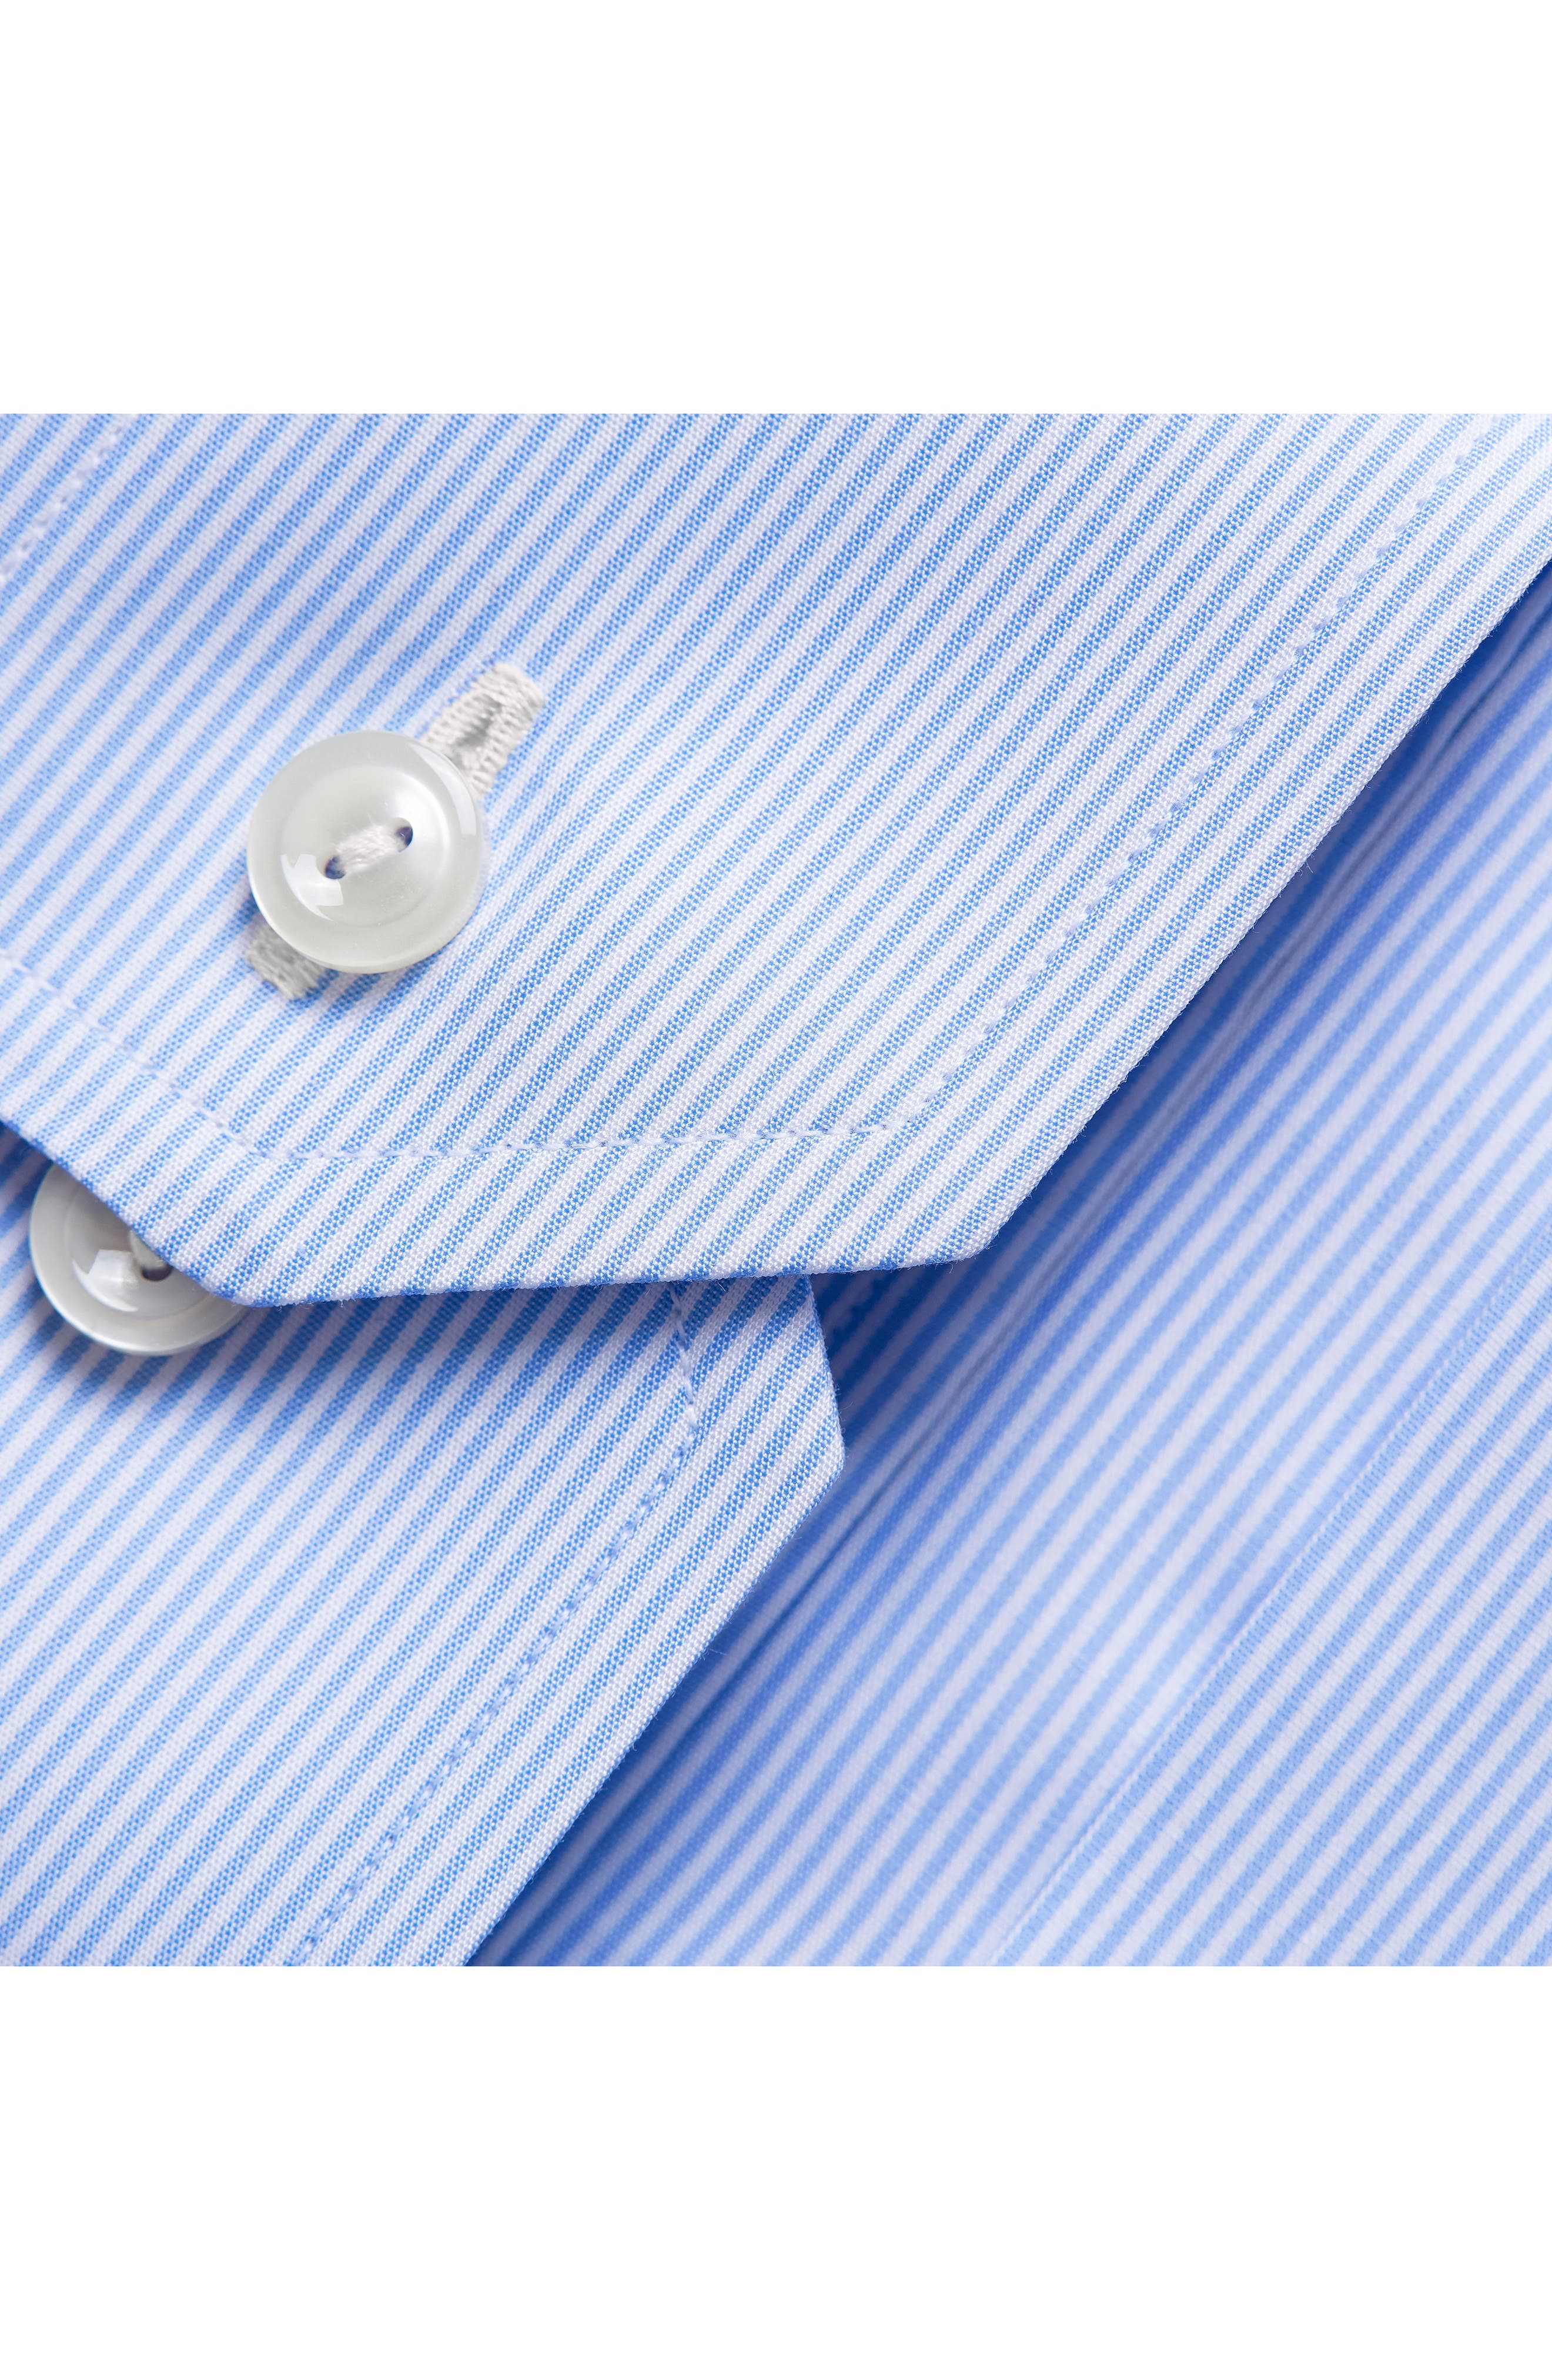 Contemporary Fit Stripe Dress Shirt,                             Alternate thumbnail 3, color,                             BLUE